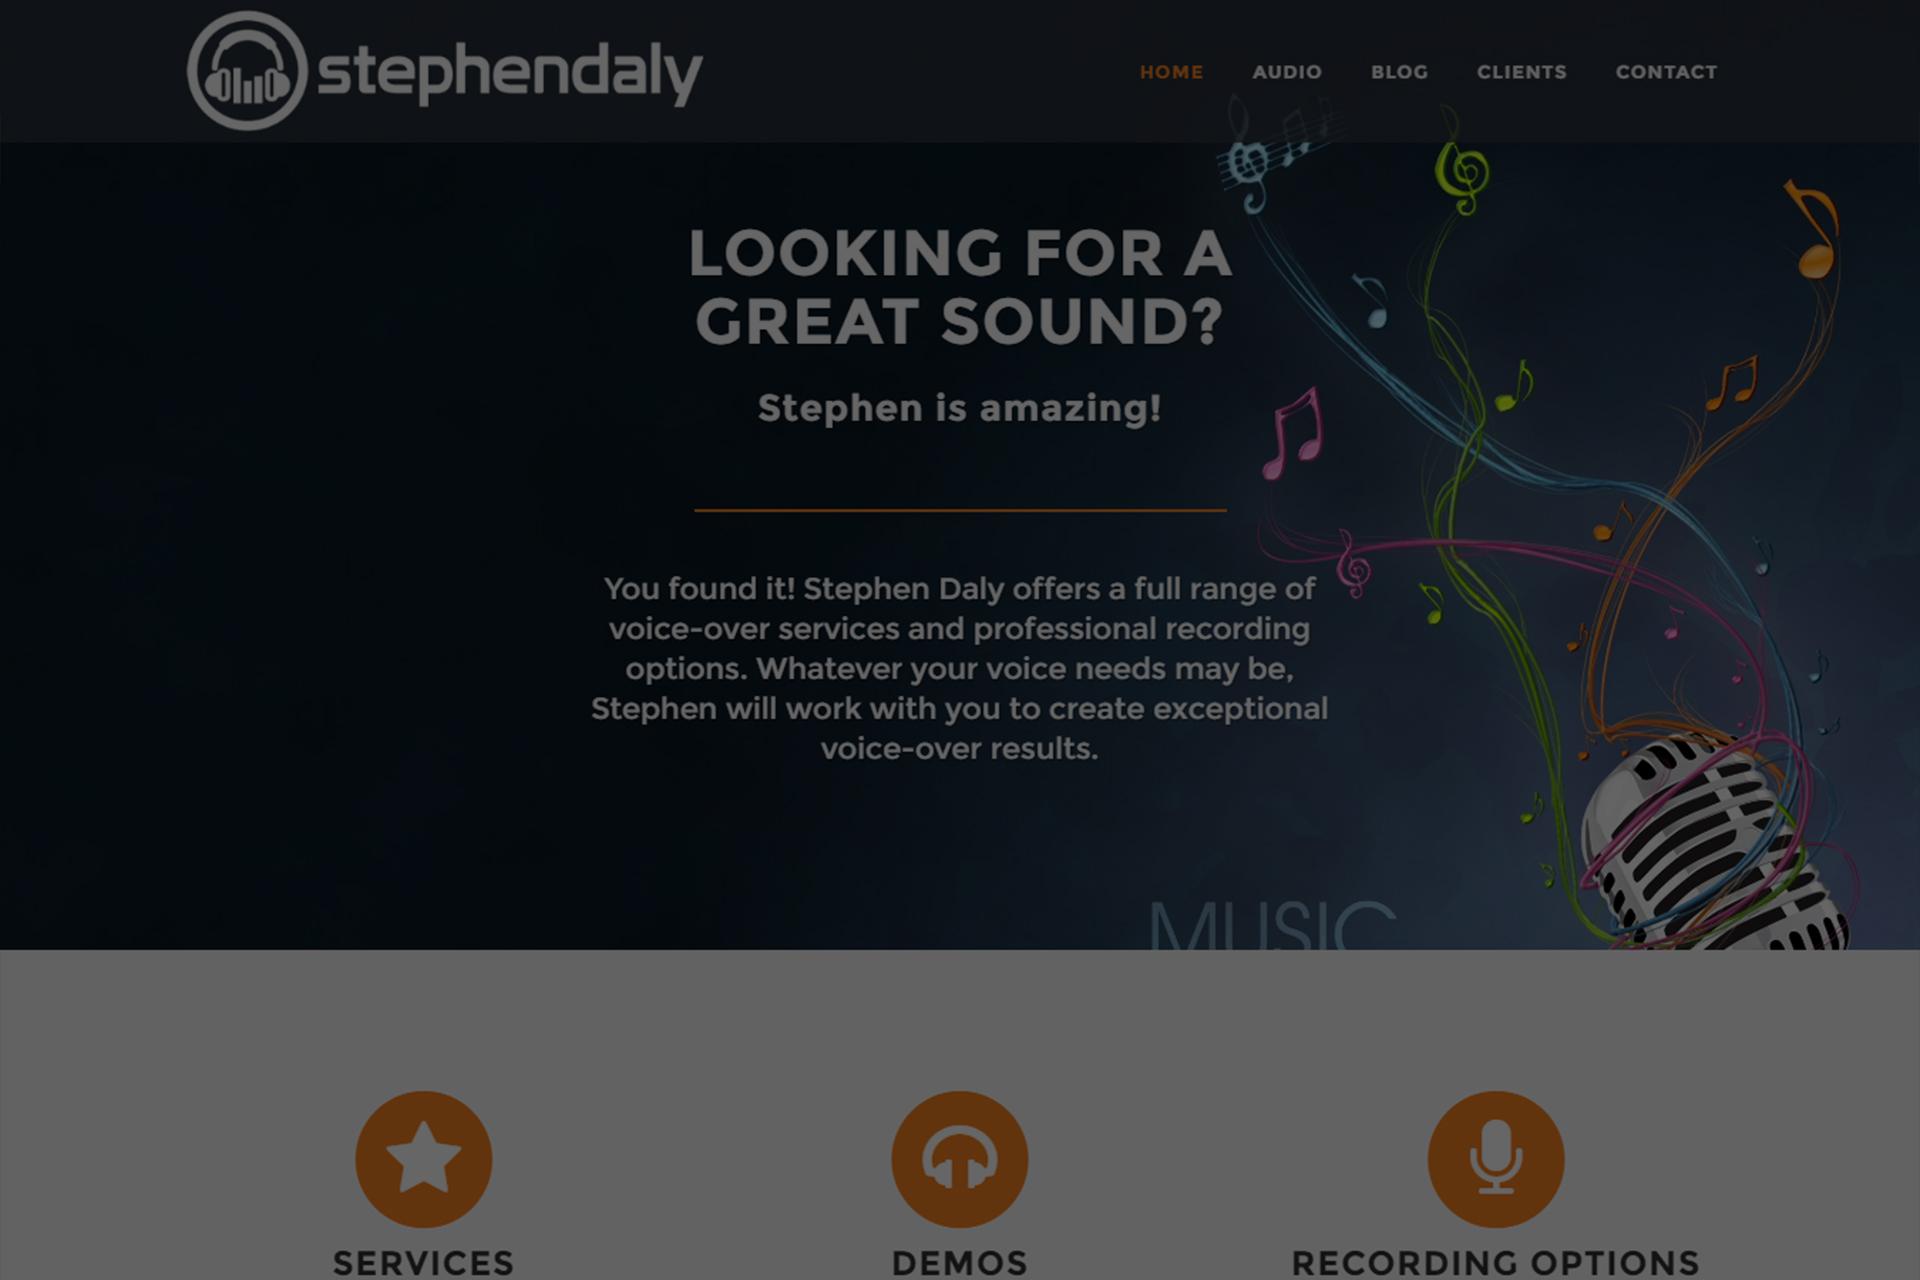 Stephendaly